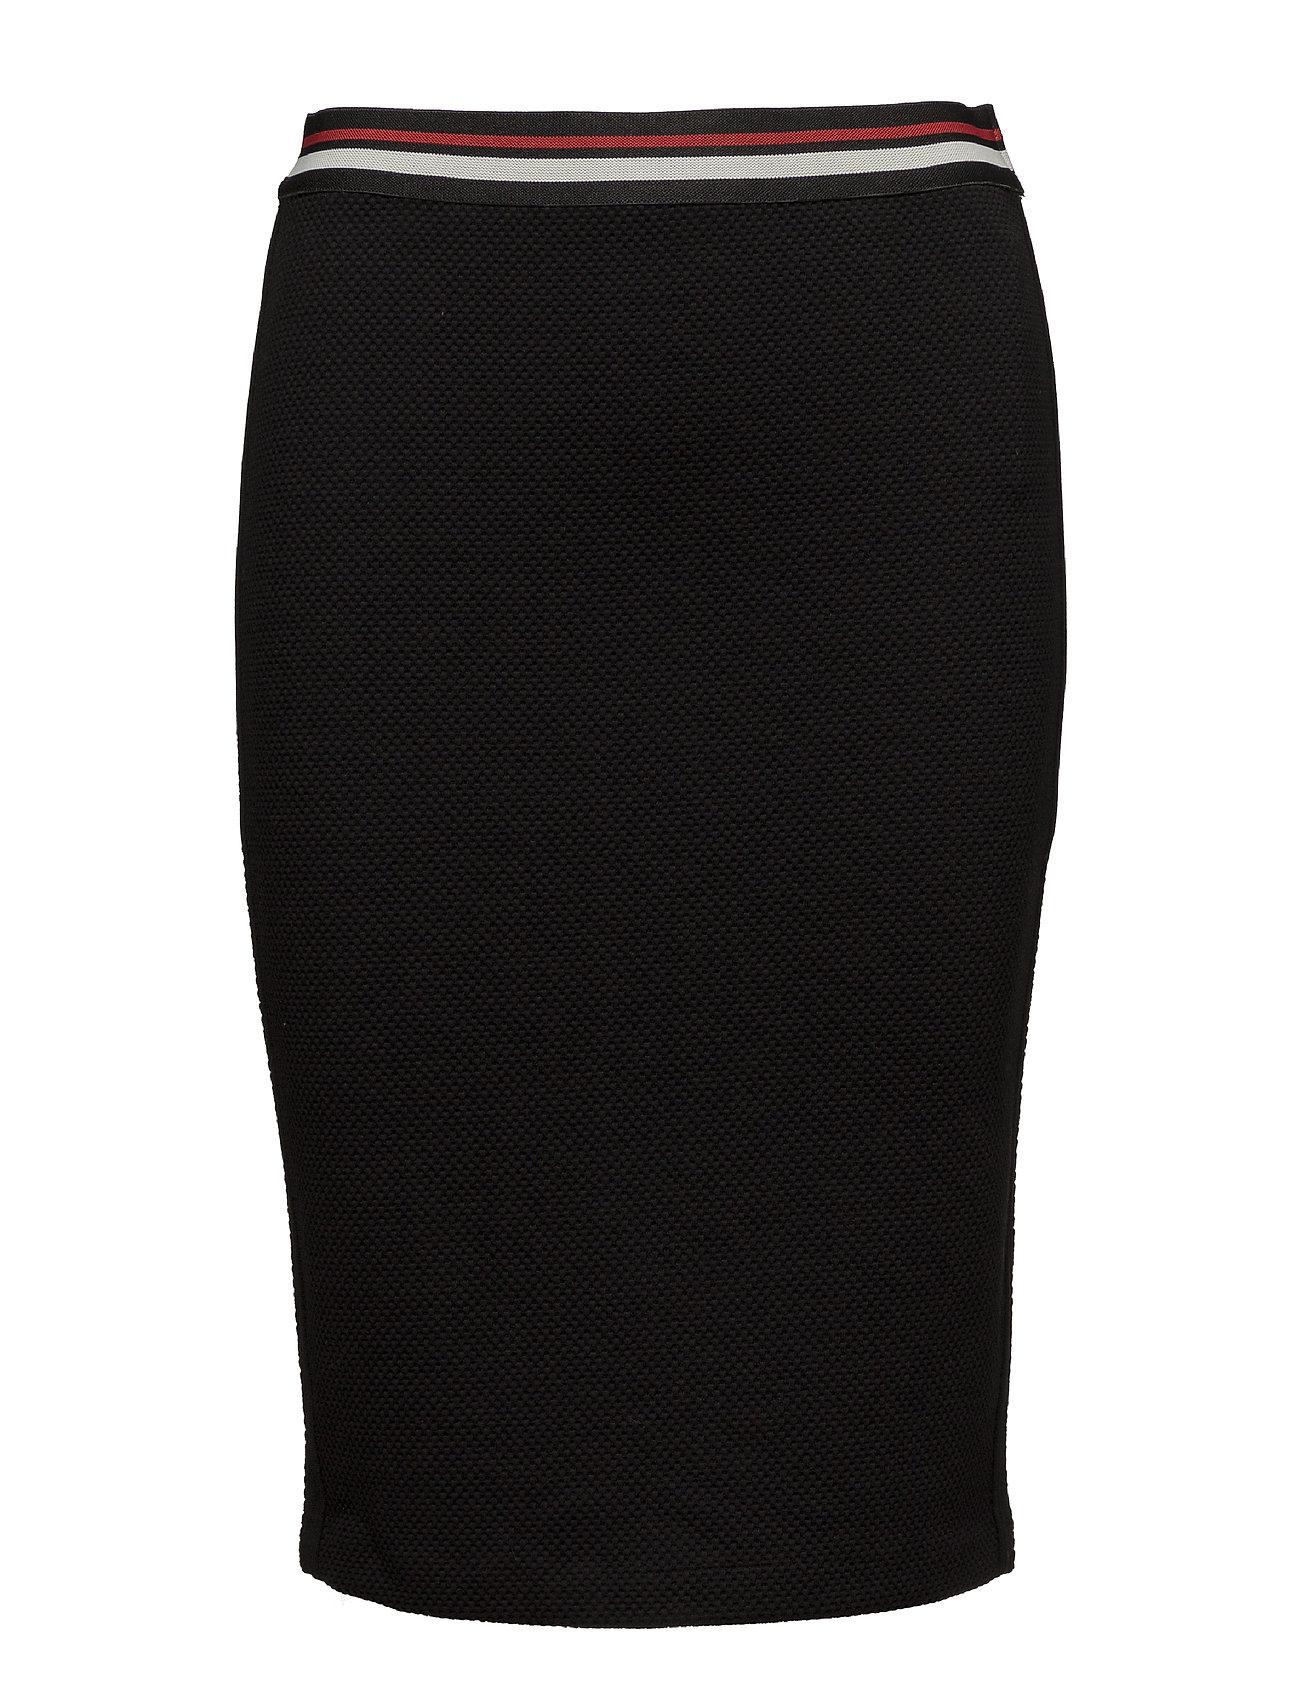 Skirt Knitwear